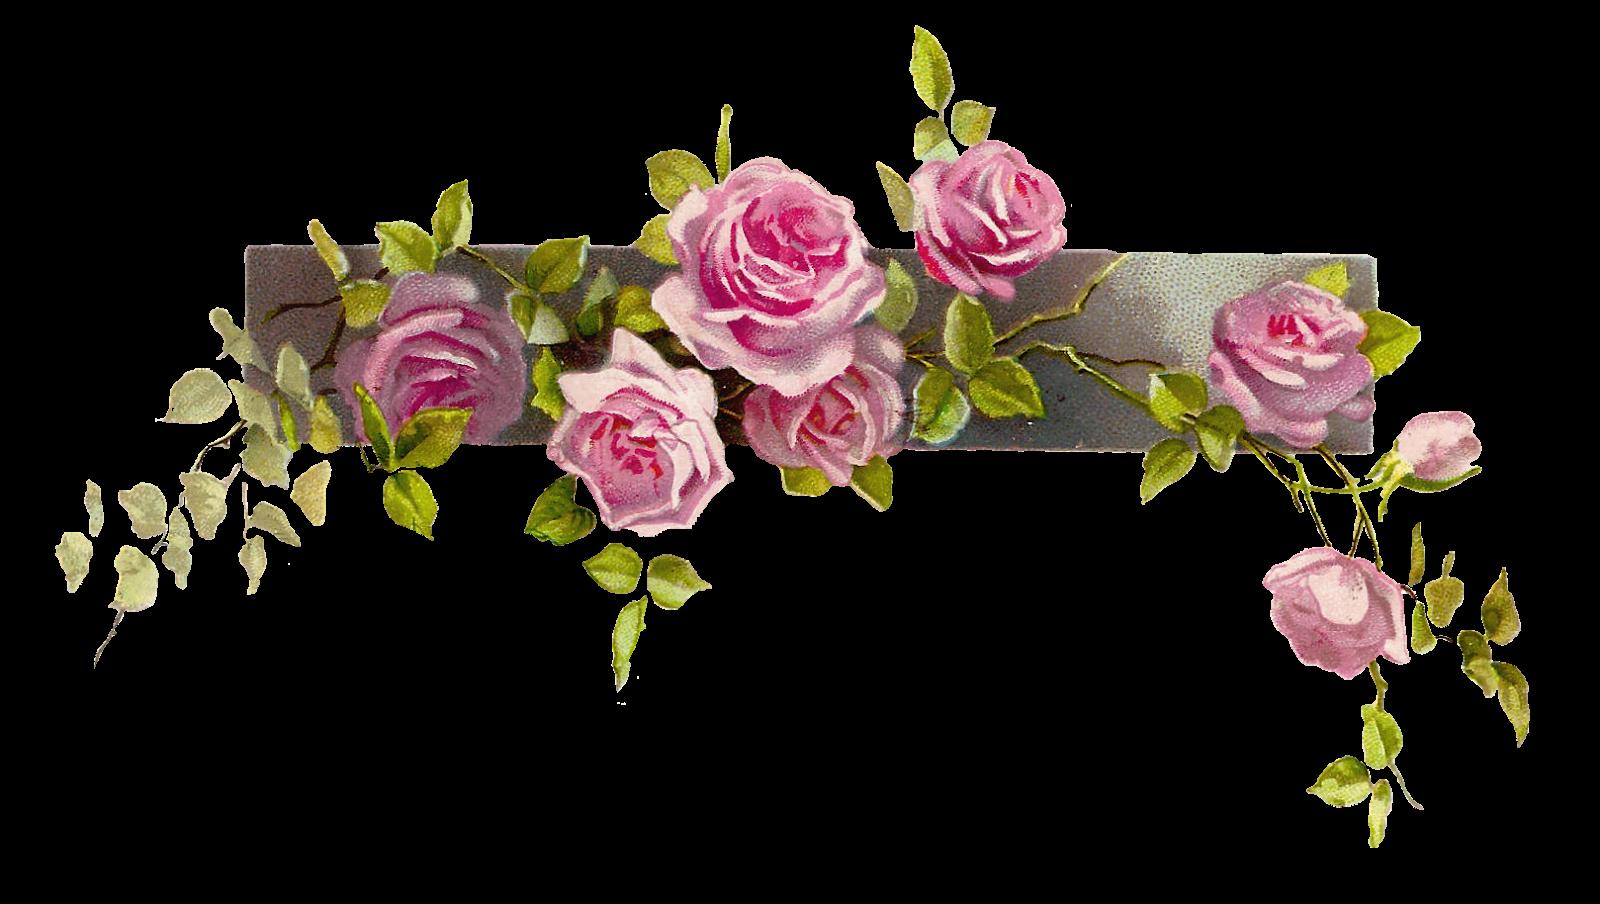 Pink flower border clipart jpg black and white 失聲記 | Pinterest | Victorian and Digital jpg black and white